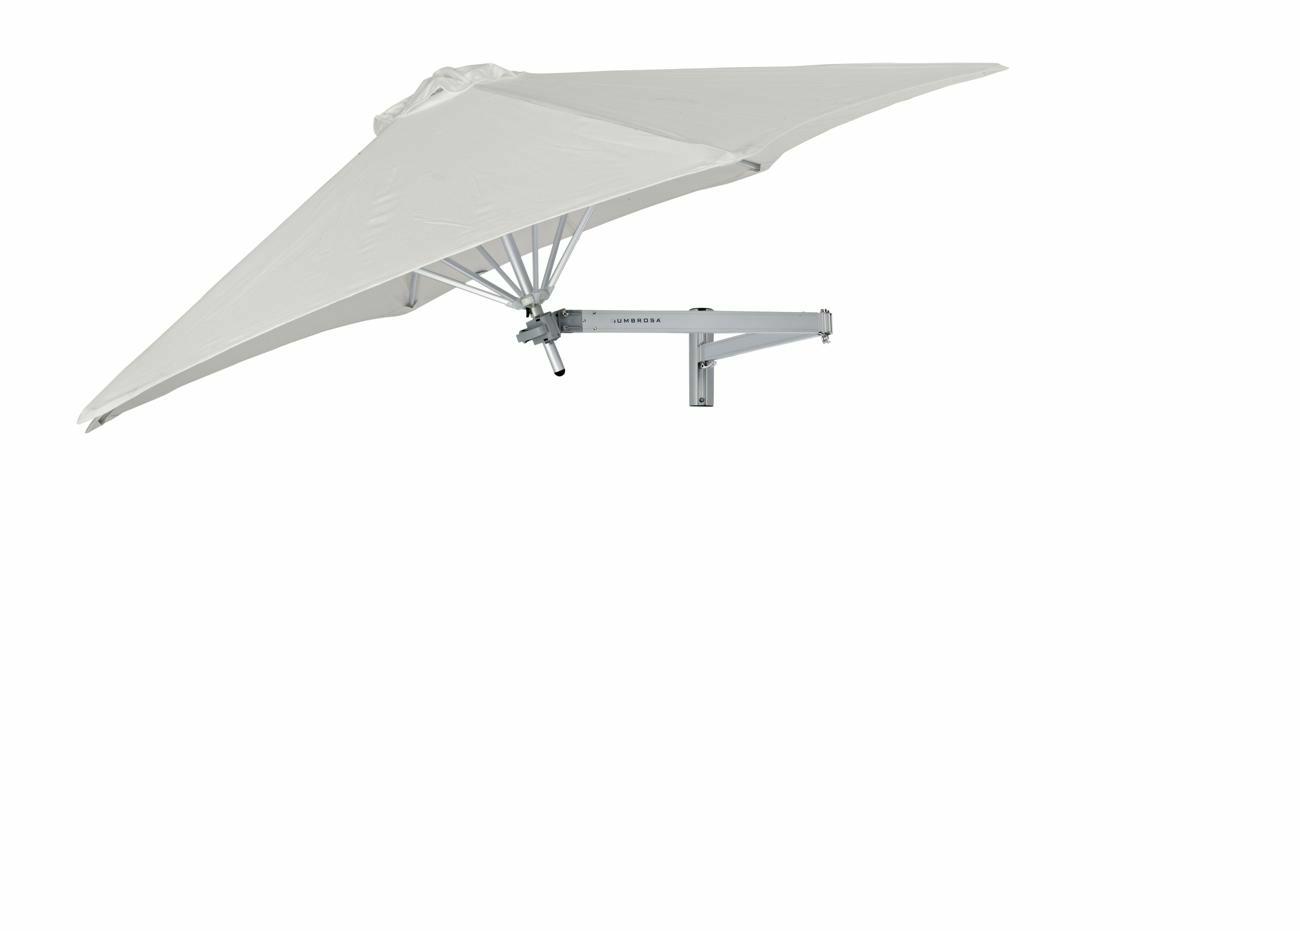 Paraflex Balkon Sonnenschirm